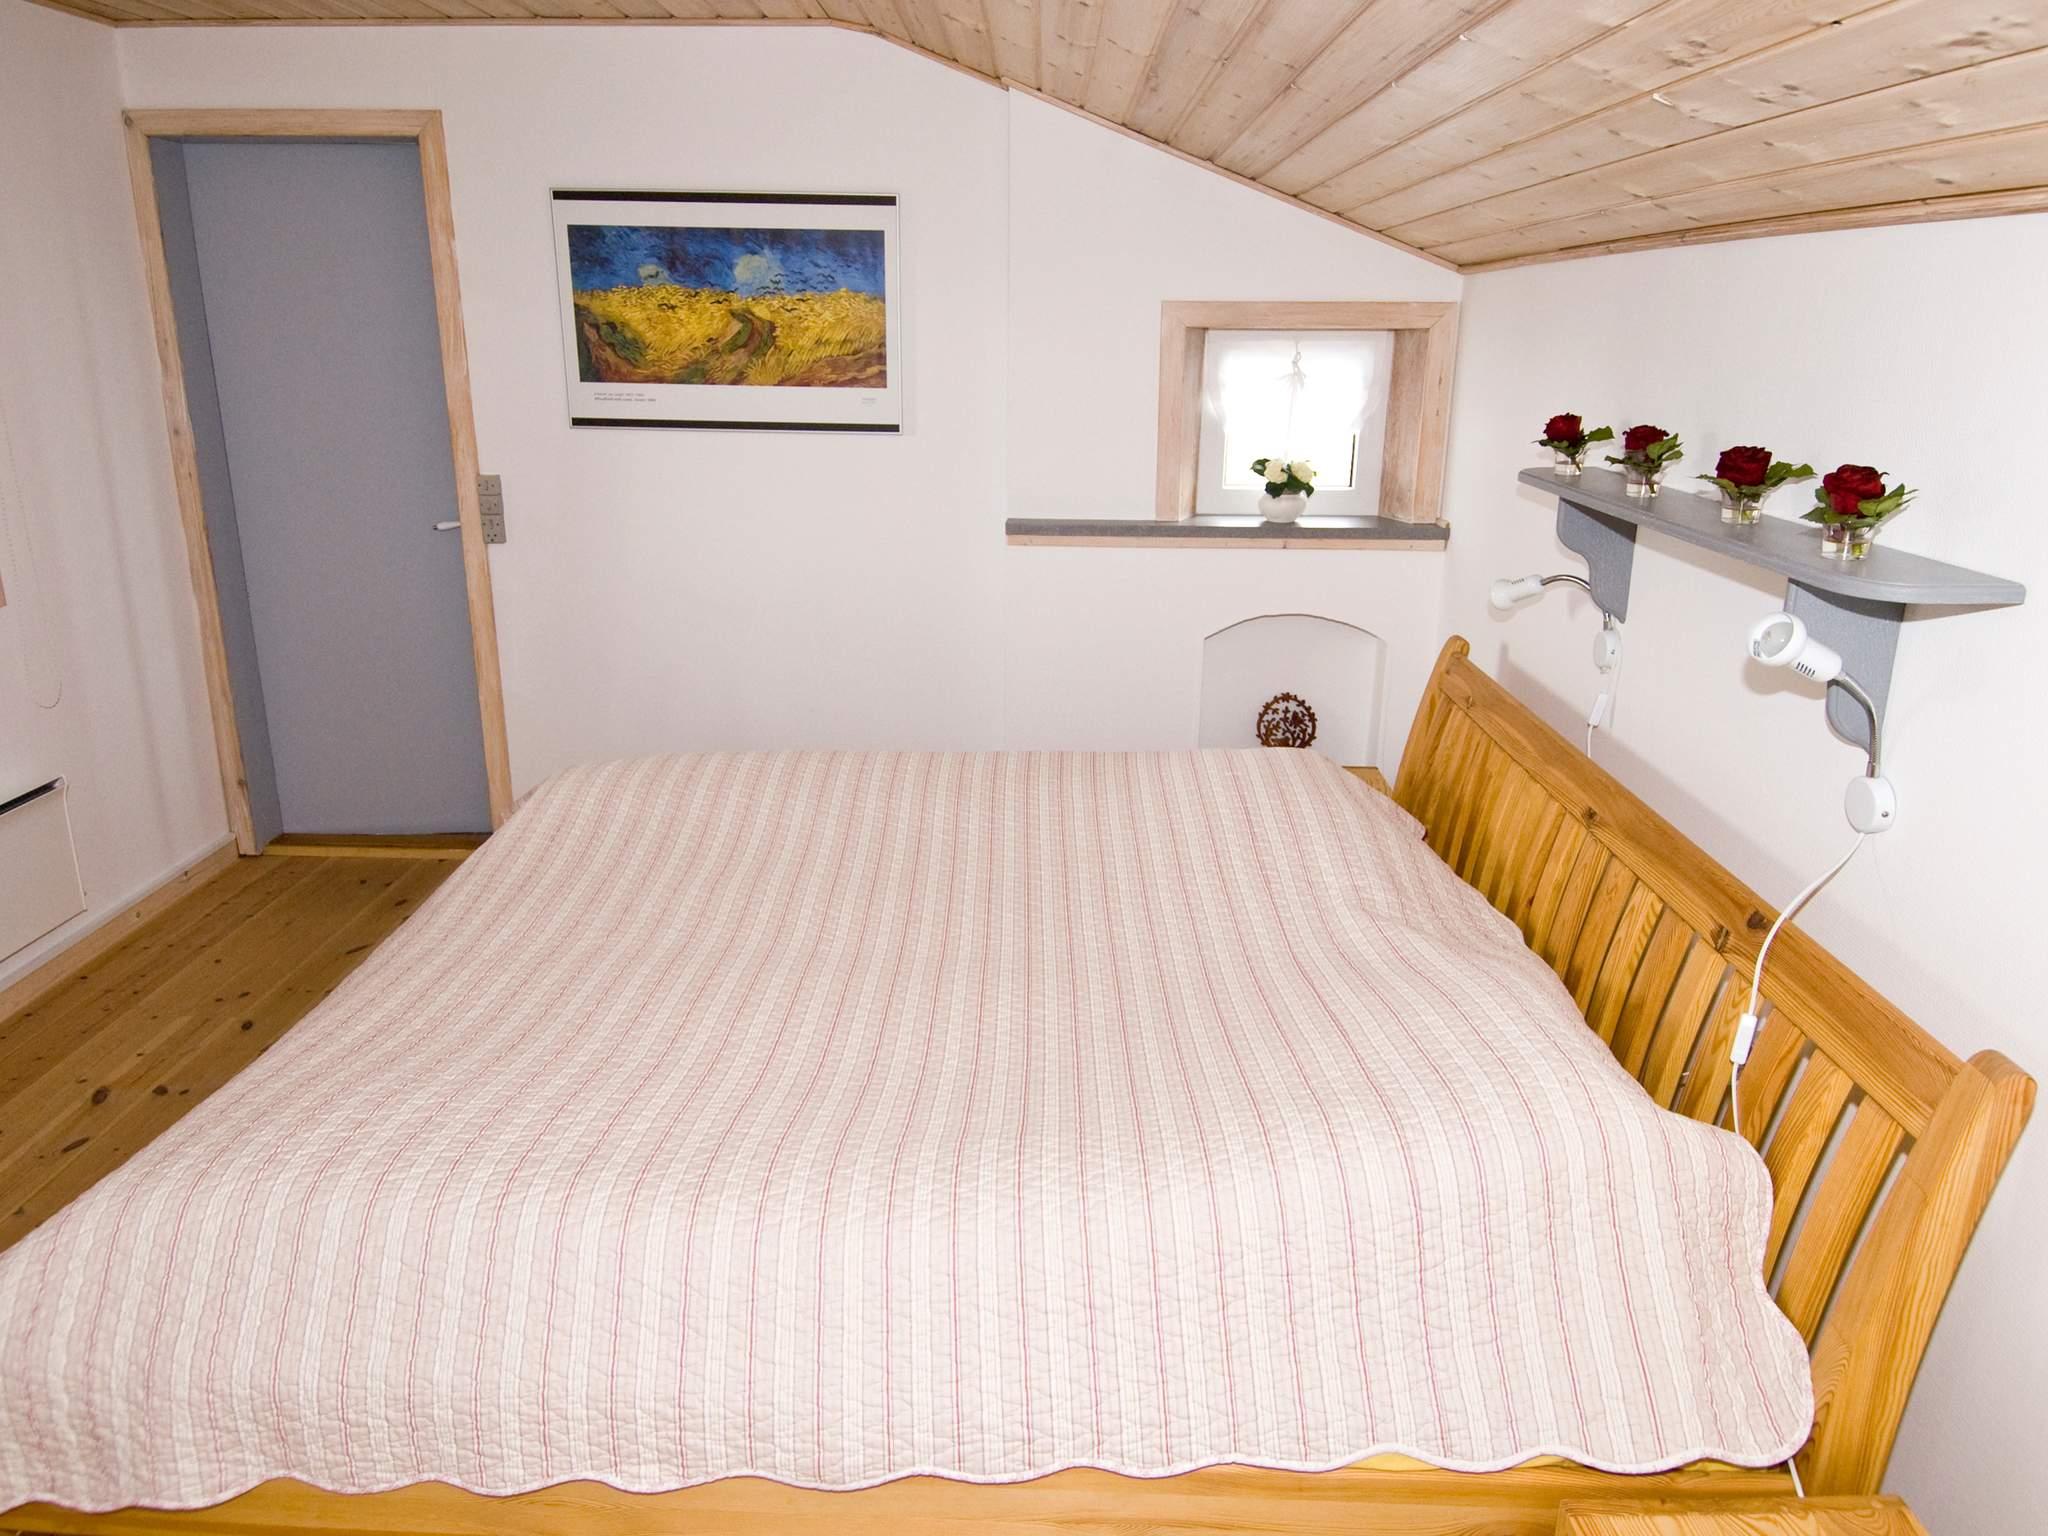 Ferienhaus Langerhuse (88910), Langerhuse, , Limfjord, Dänemark, Bild 11